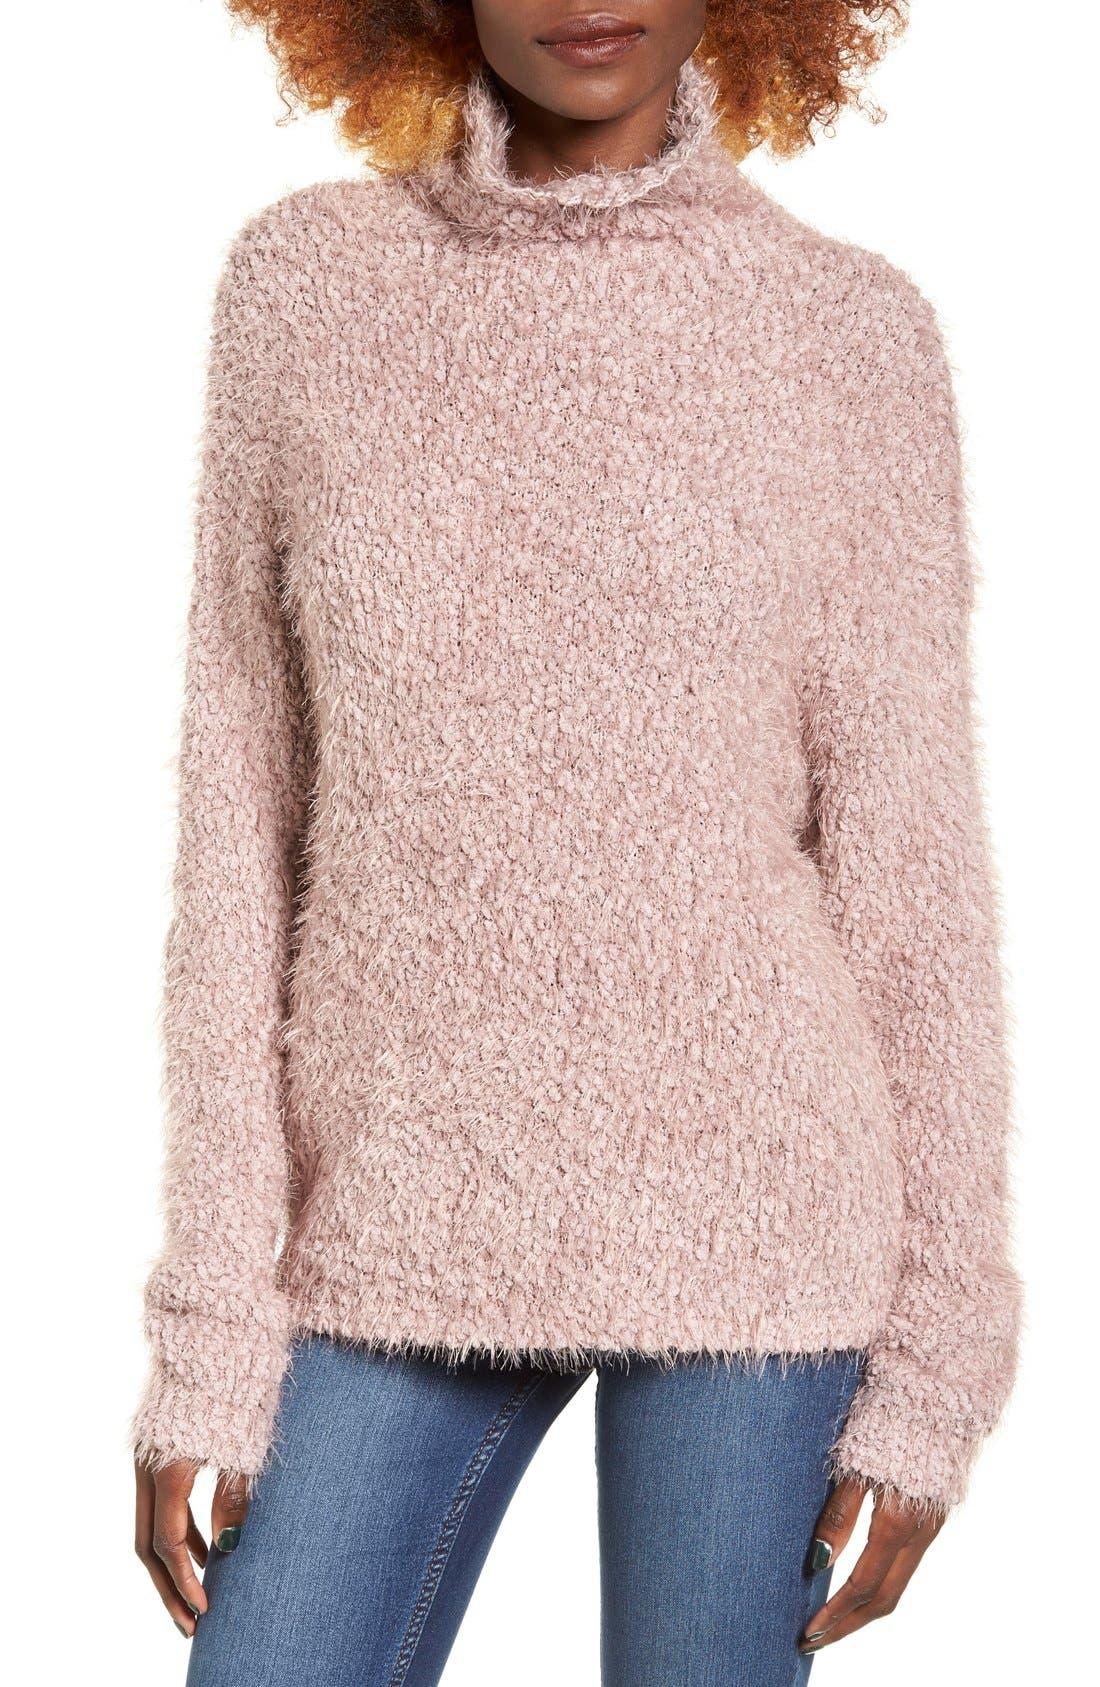 Alternate Image 1 Selected - BP. Fluffy Knit Mock Neck Pullover